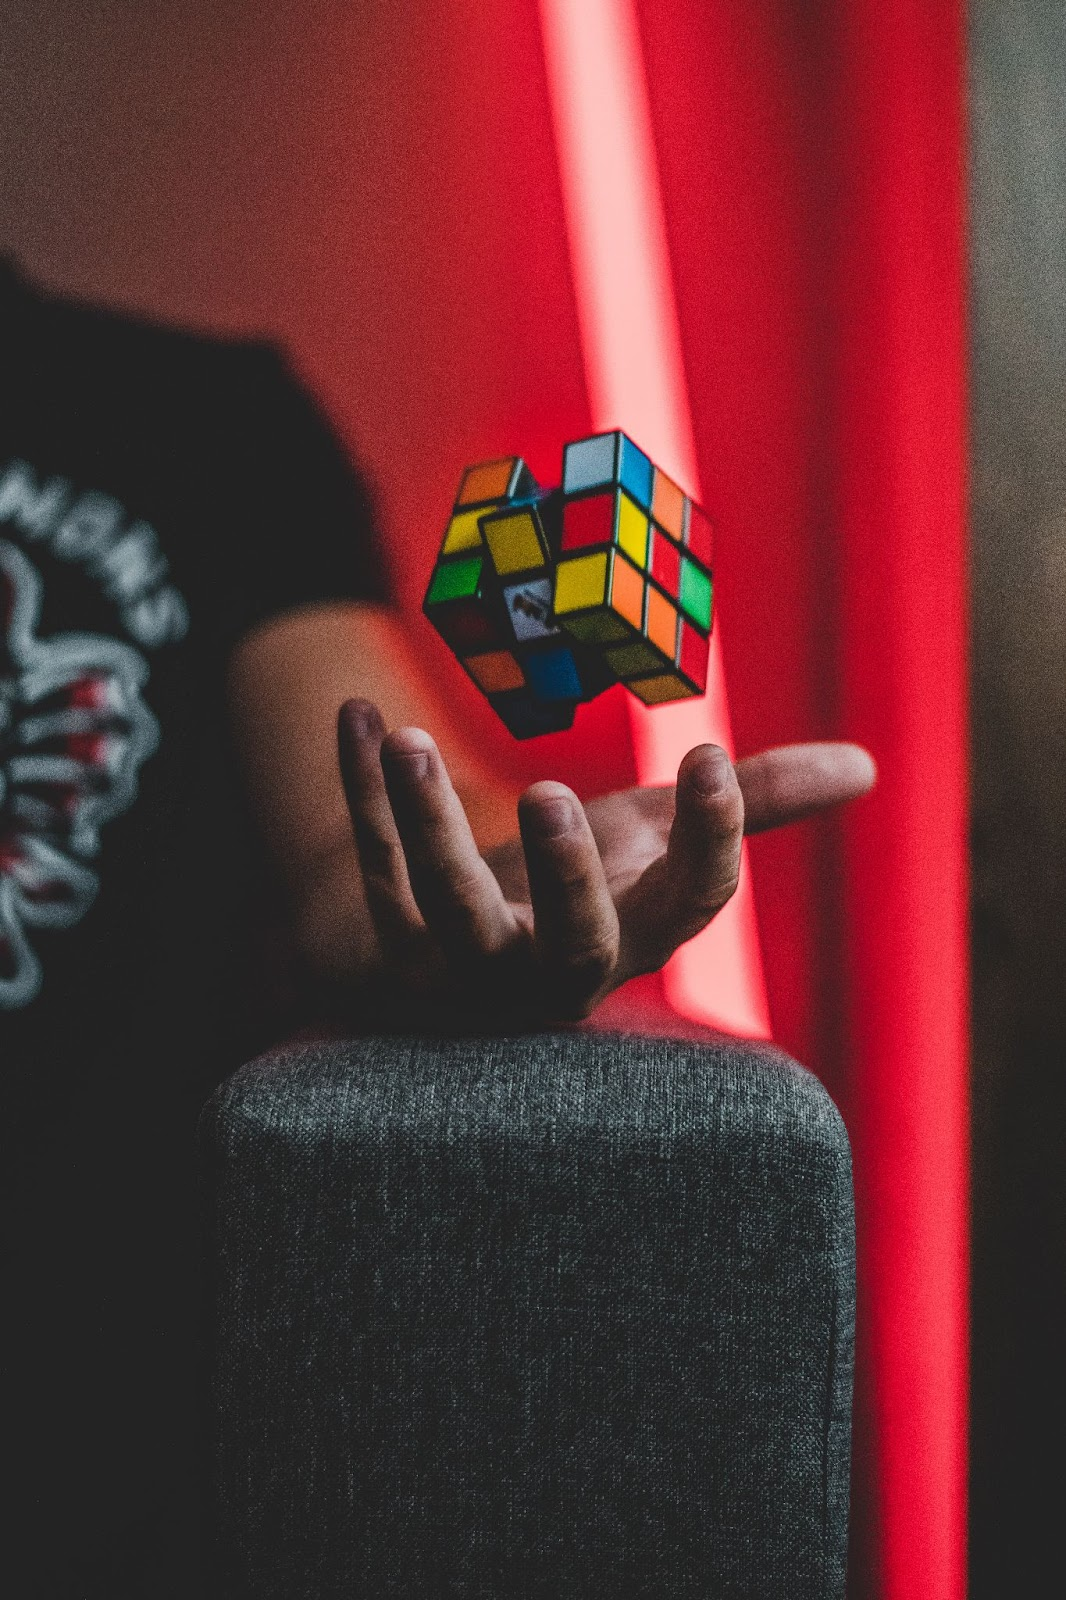 rubik's cube in human hand